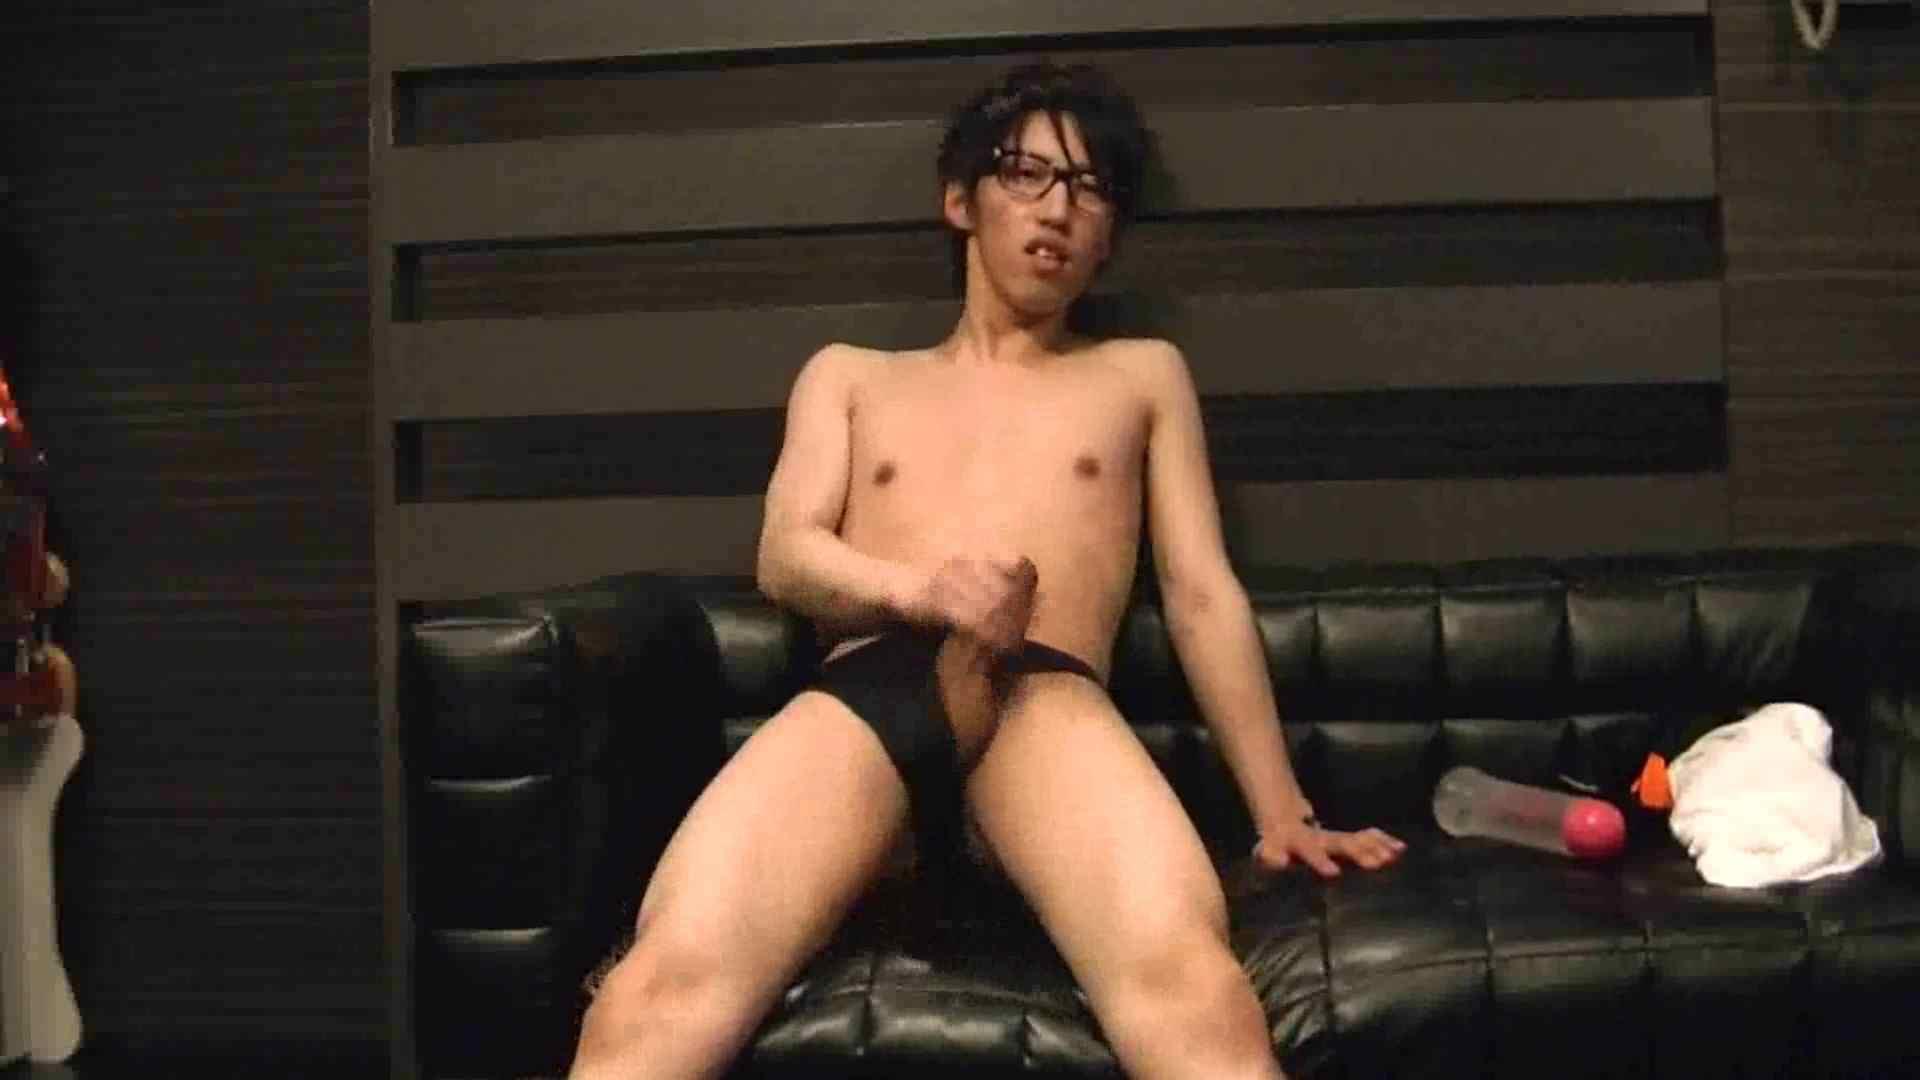 ONA見せカーニバル!! Vol3 男 ゲイ無料無修正画像 89枚 7